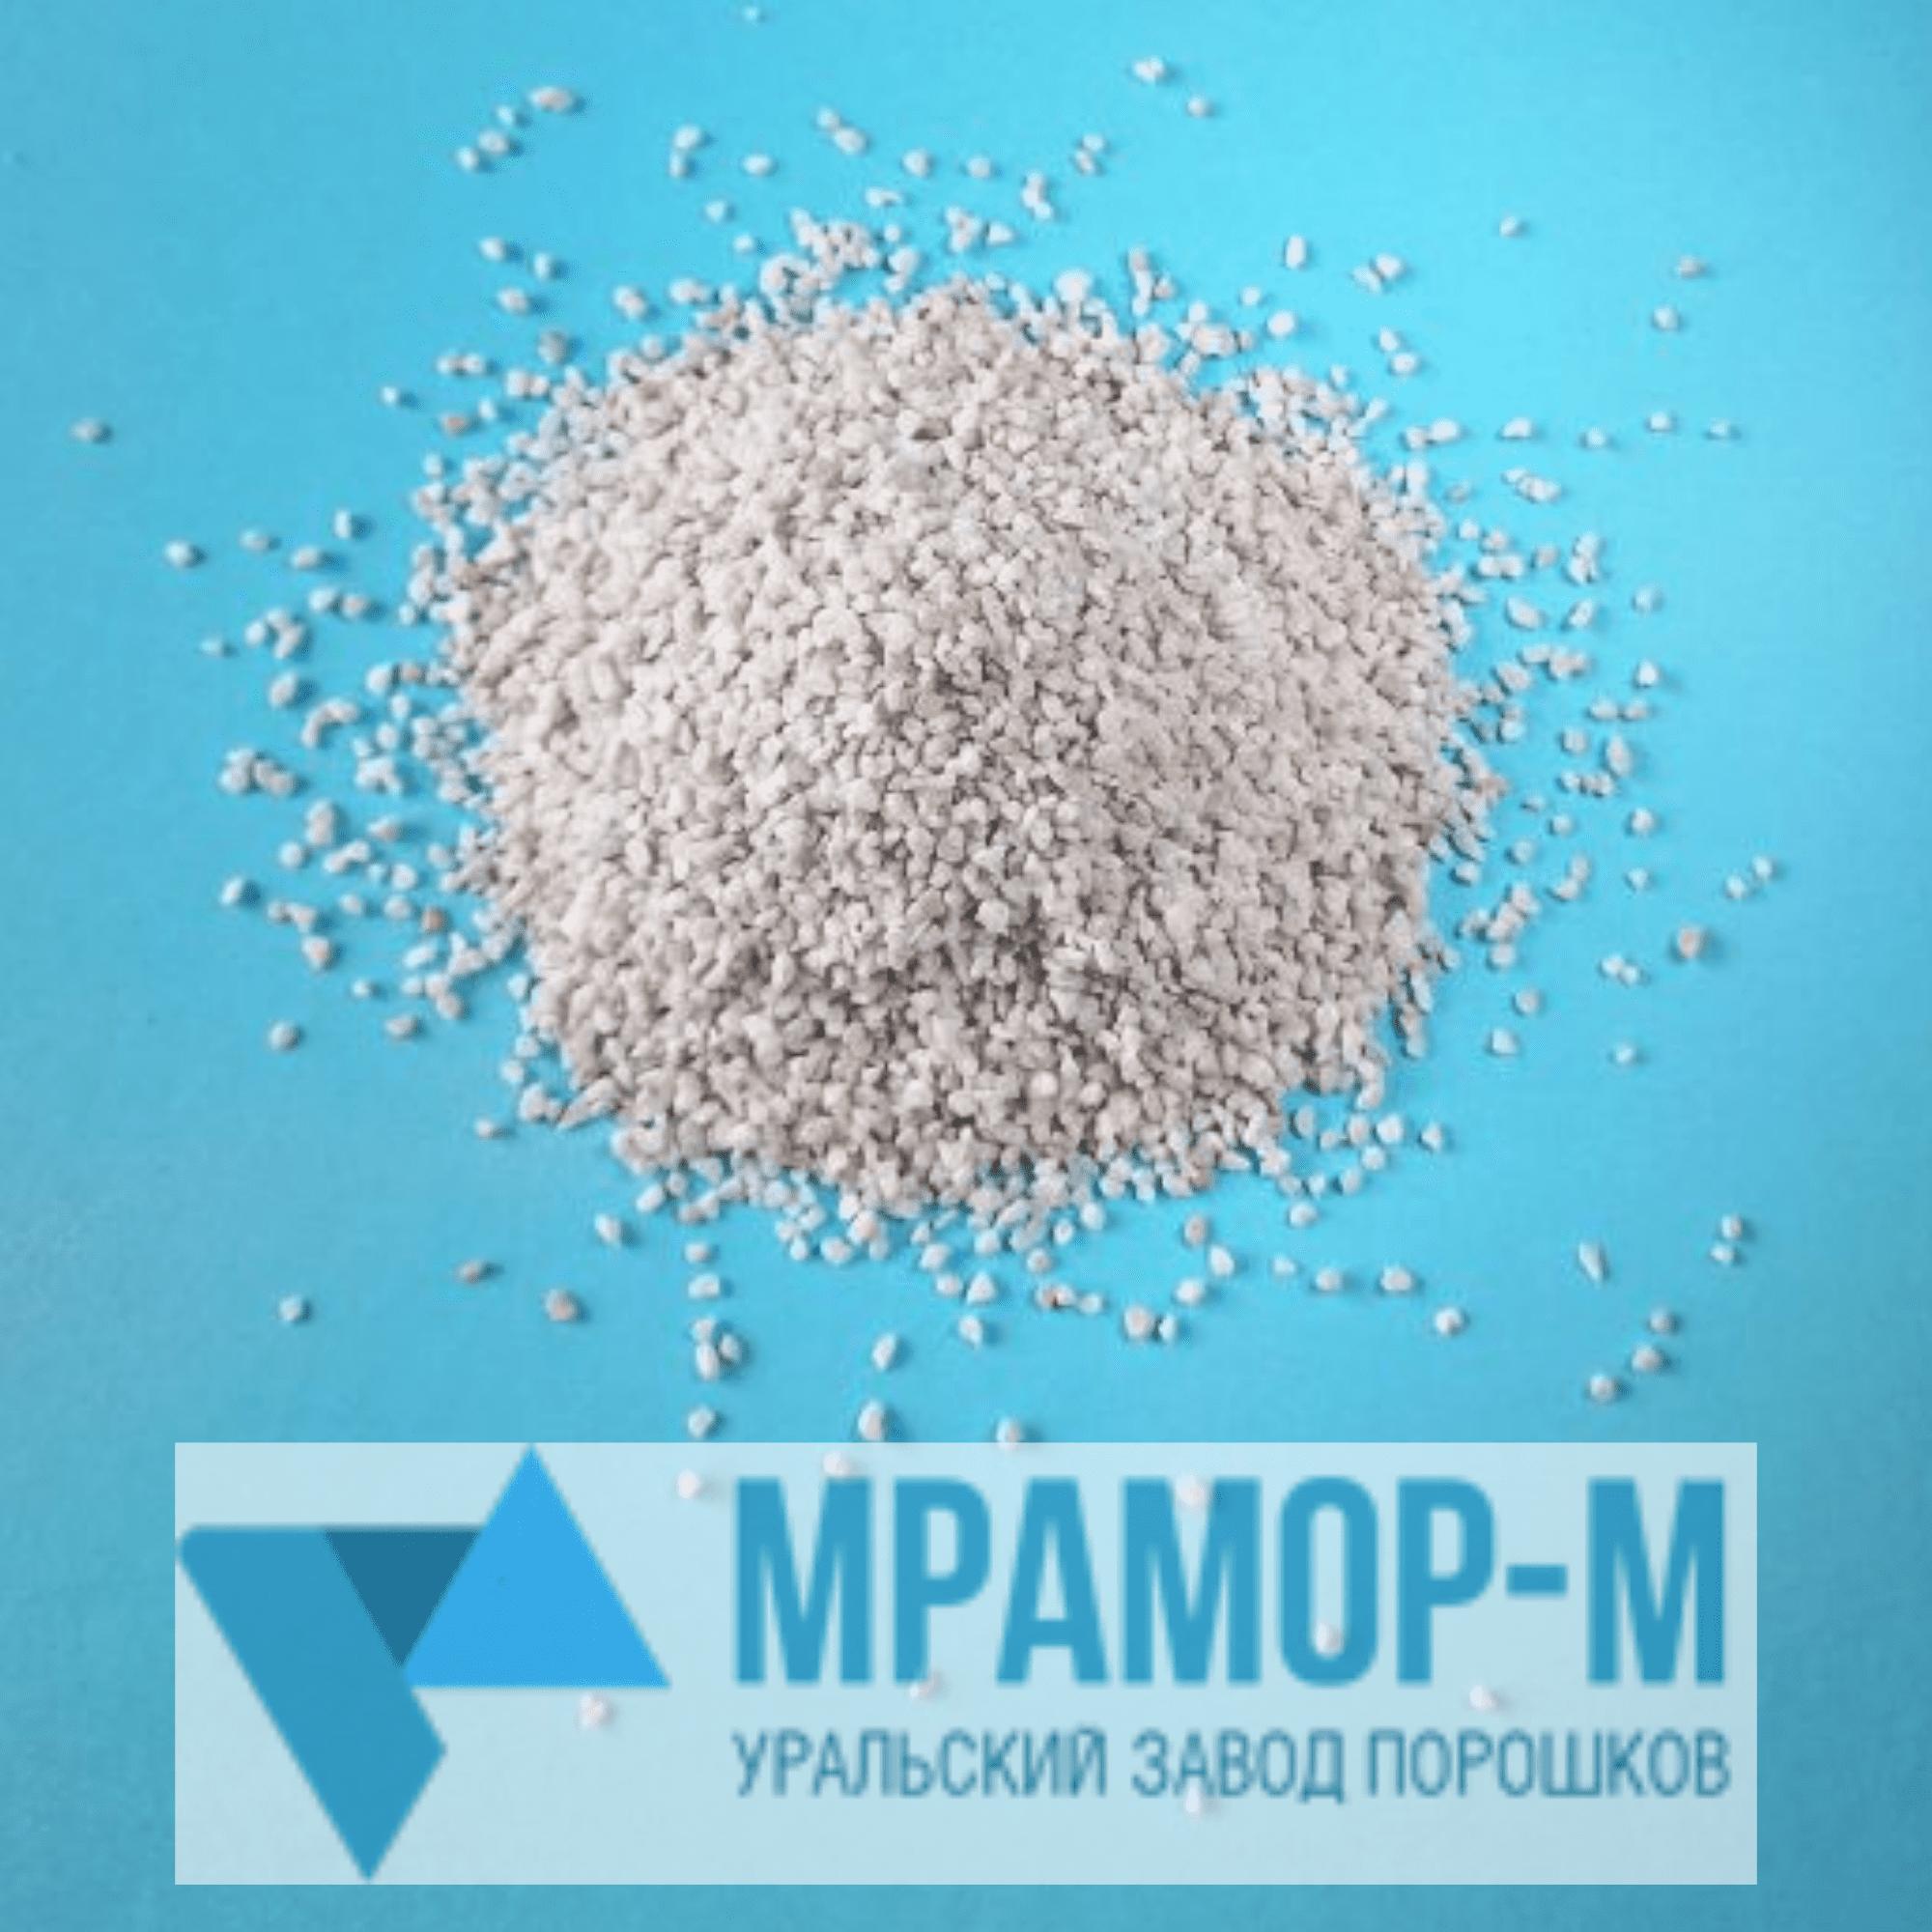 мраморный песок светло-серый 2-2,5 мм